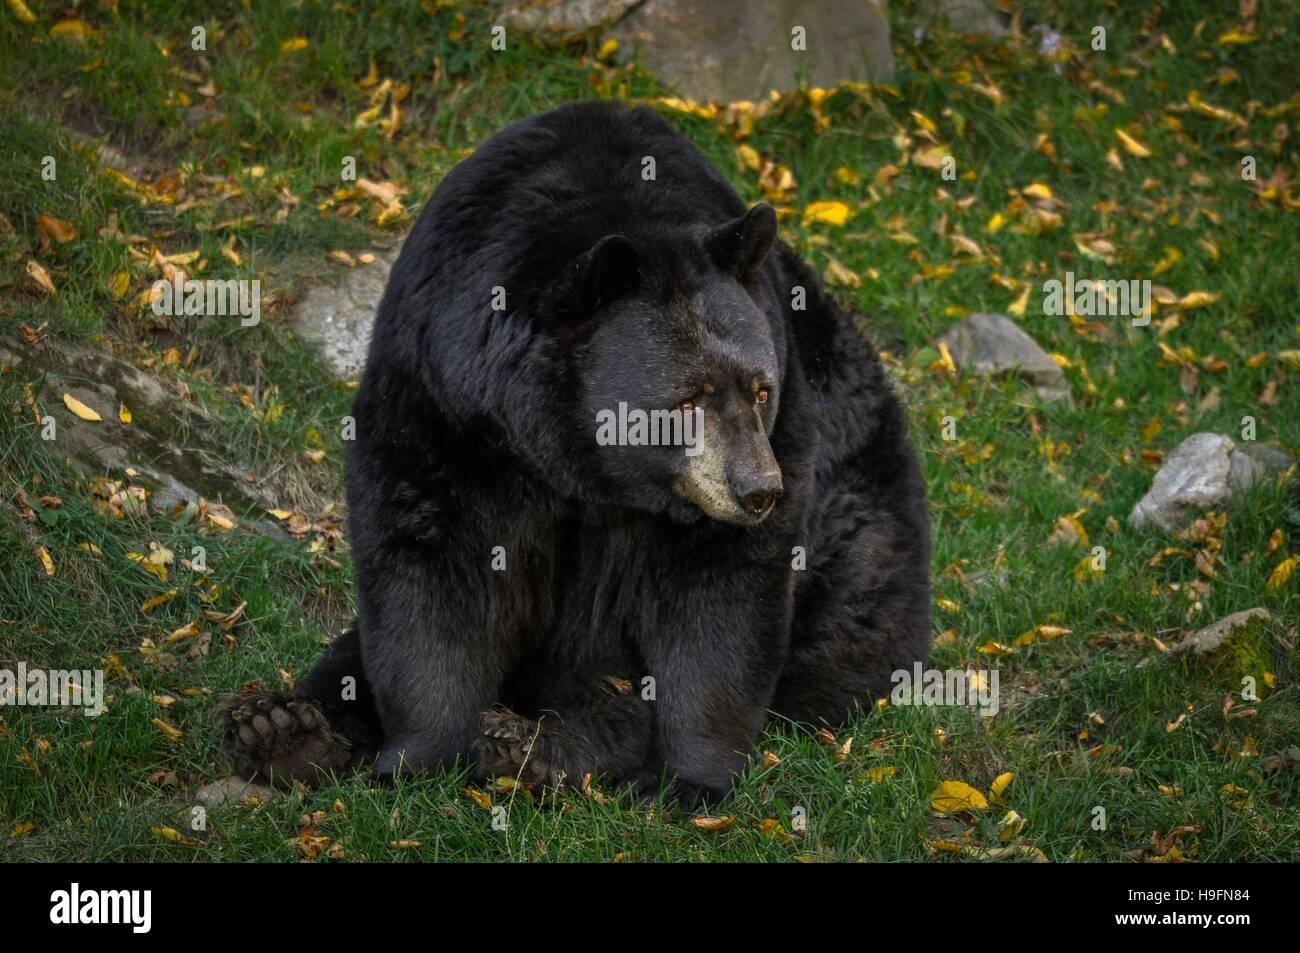 Black bear wondering what's going on. - Stock Image